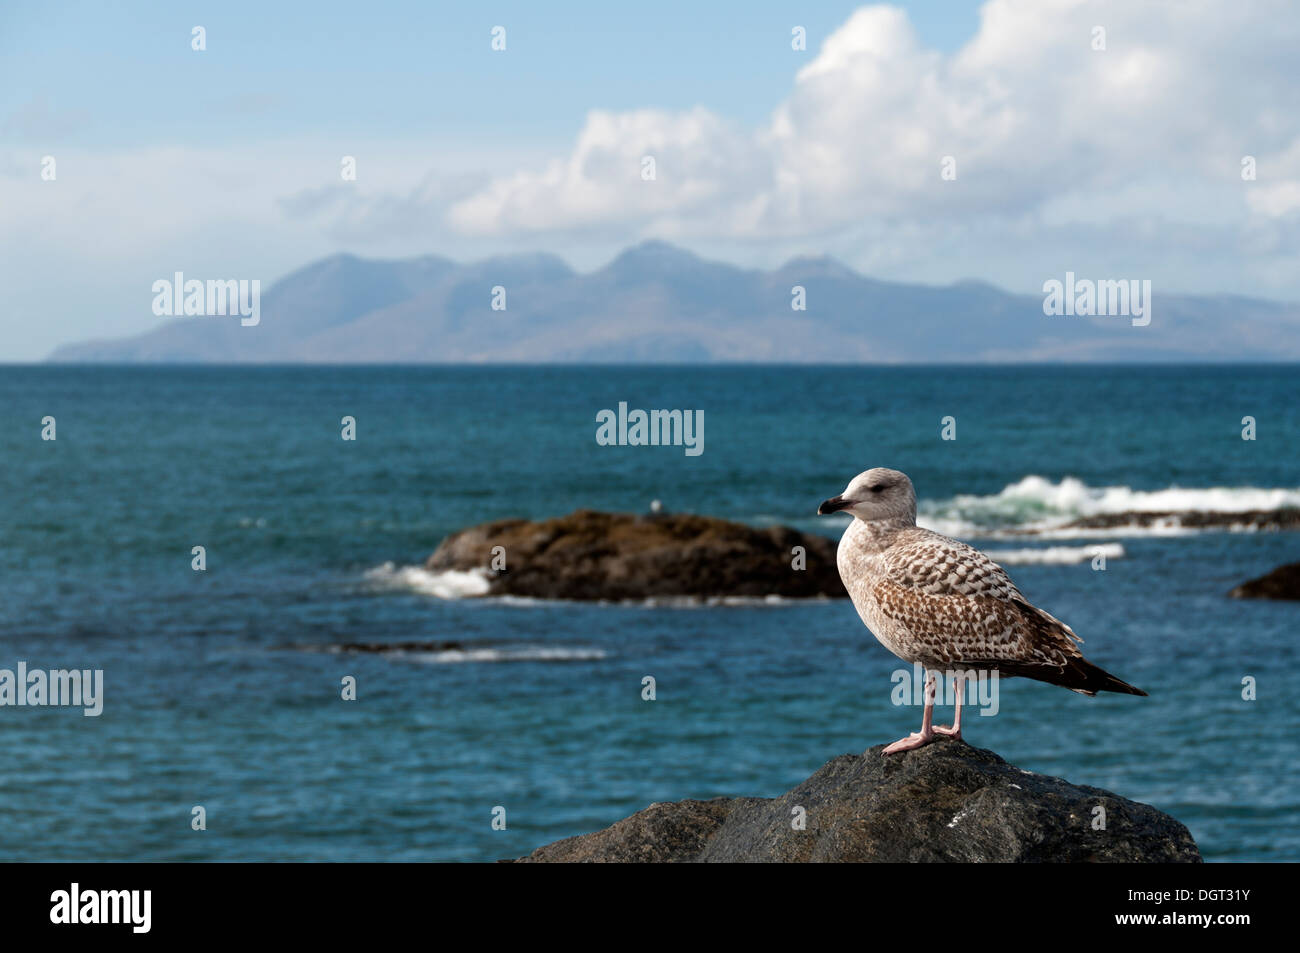 Immature Herring Gull (Larus argentatus), at Mallaig, Highland region, Scotland, UK.  The Isle of Rum behind. - Stock Image